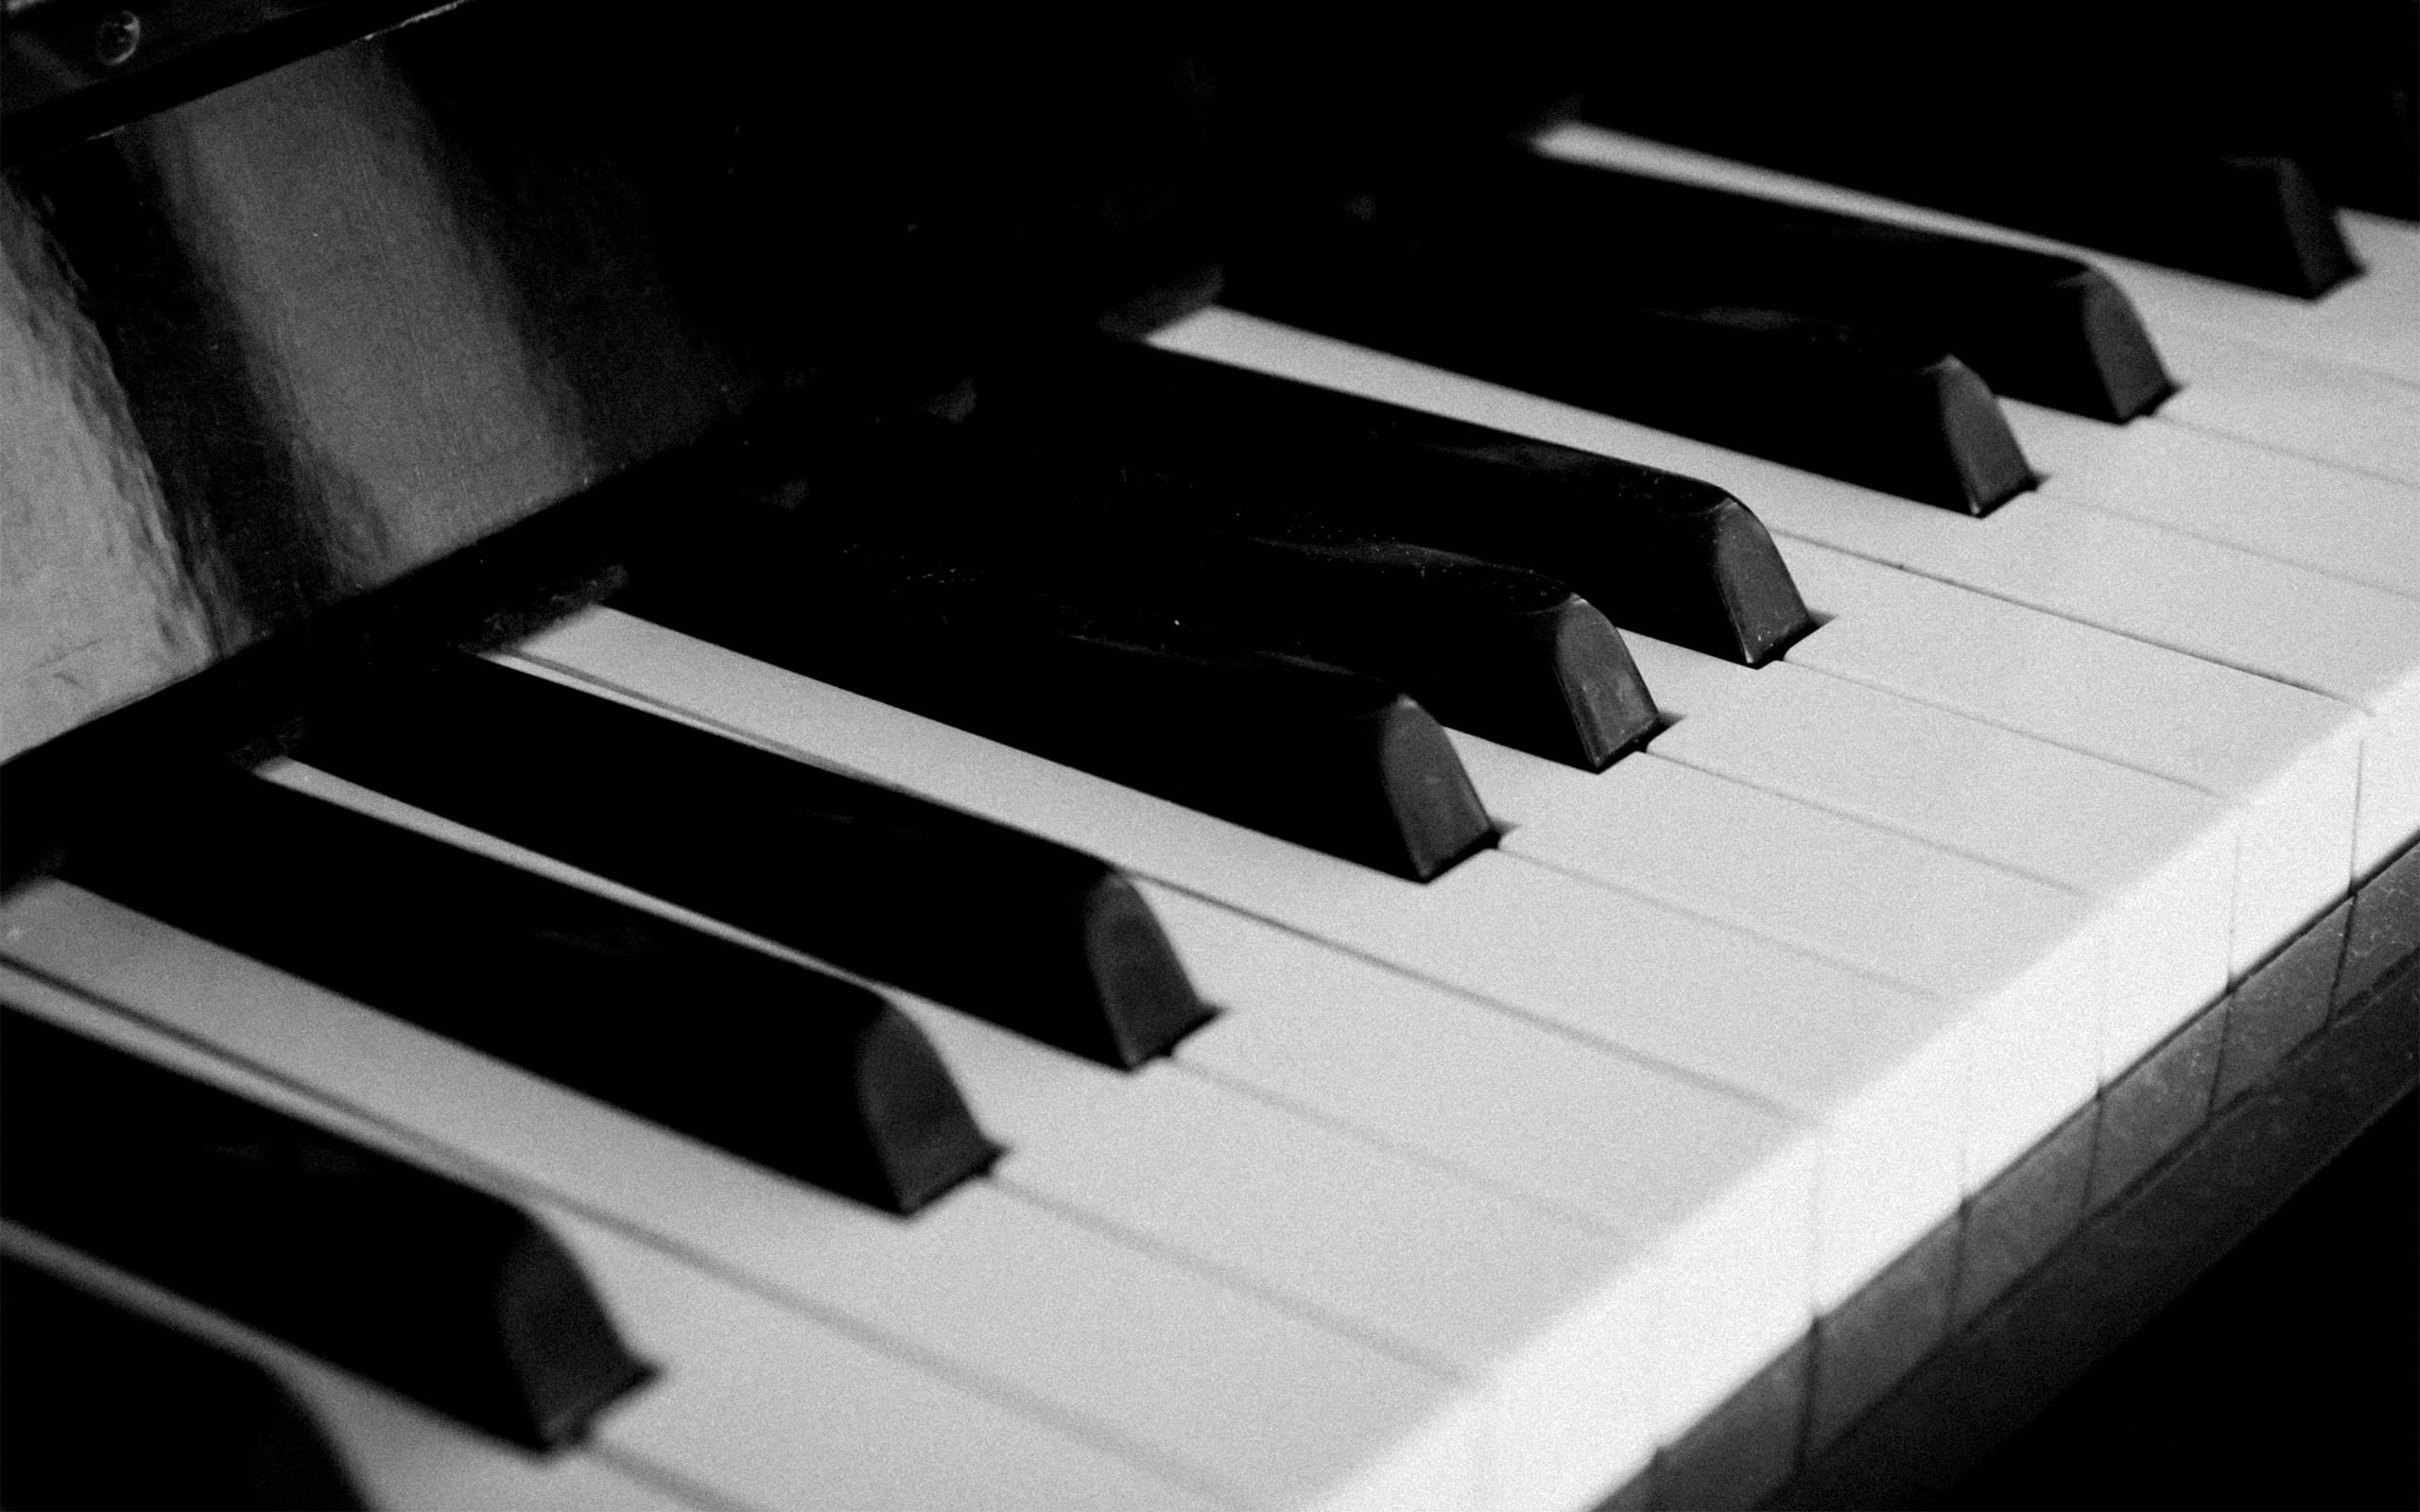 припяти картинки фортепиано на телефон маквин